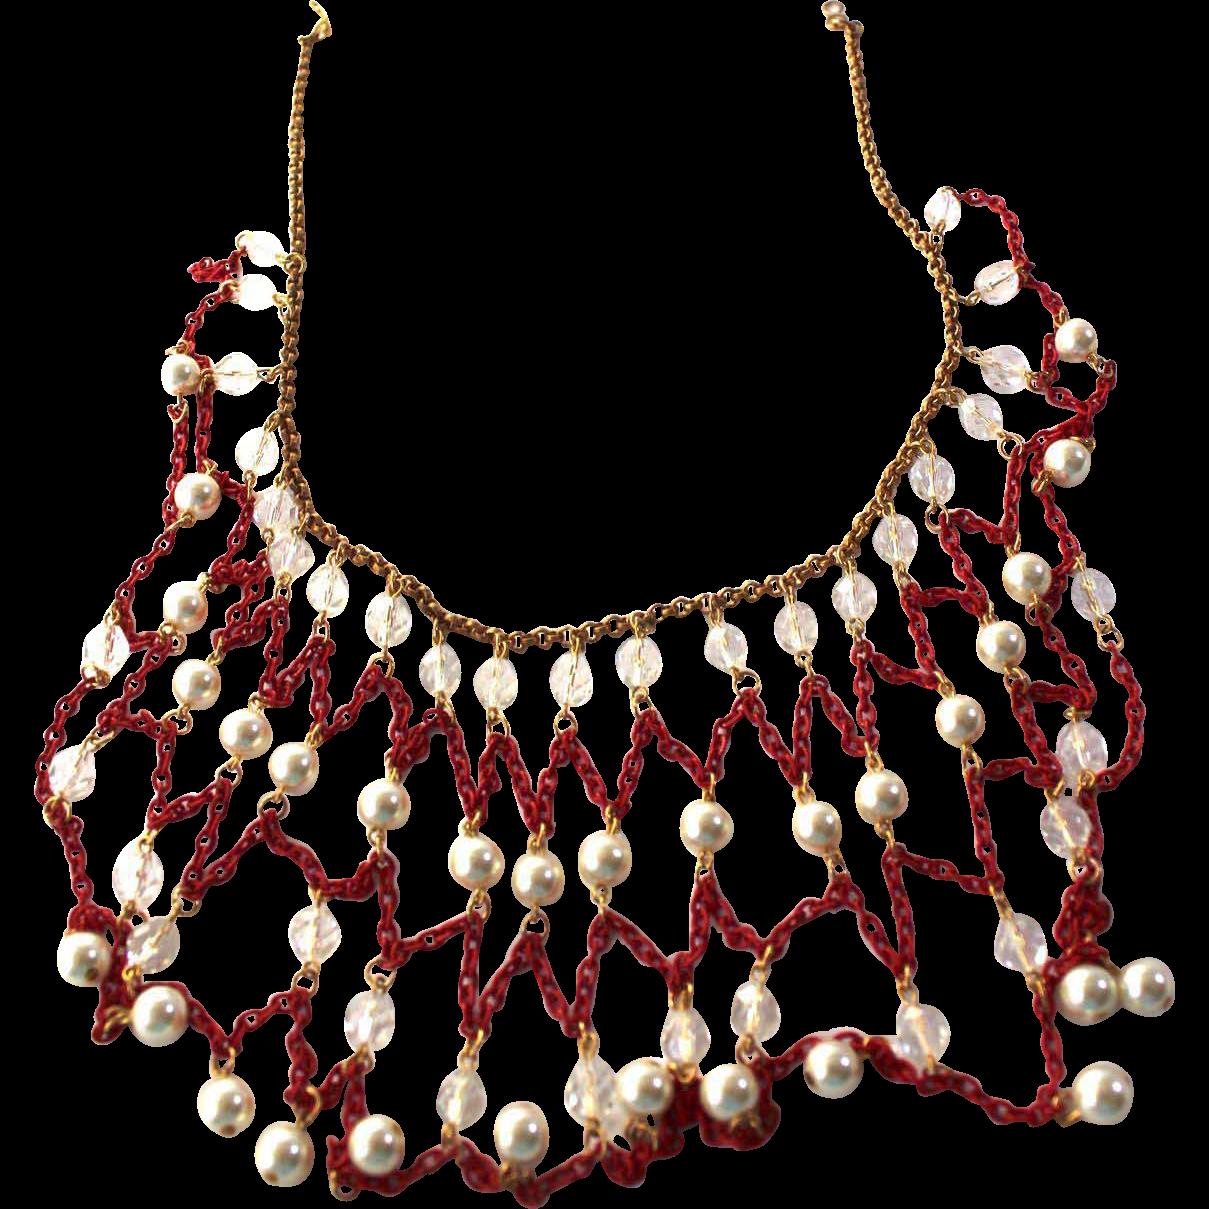 Vintage Cristy Lee Red and Gold Bib Necklace